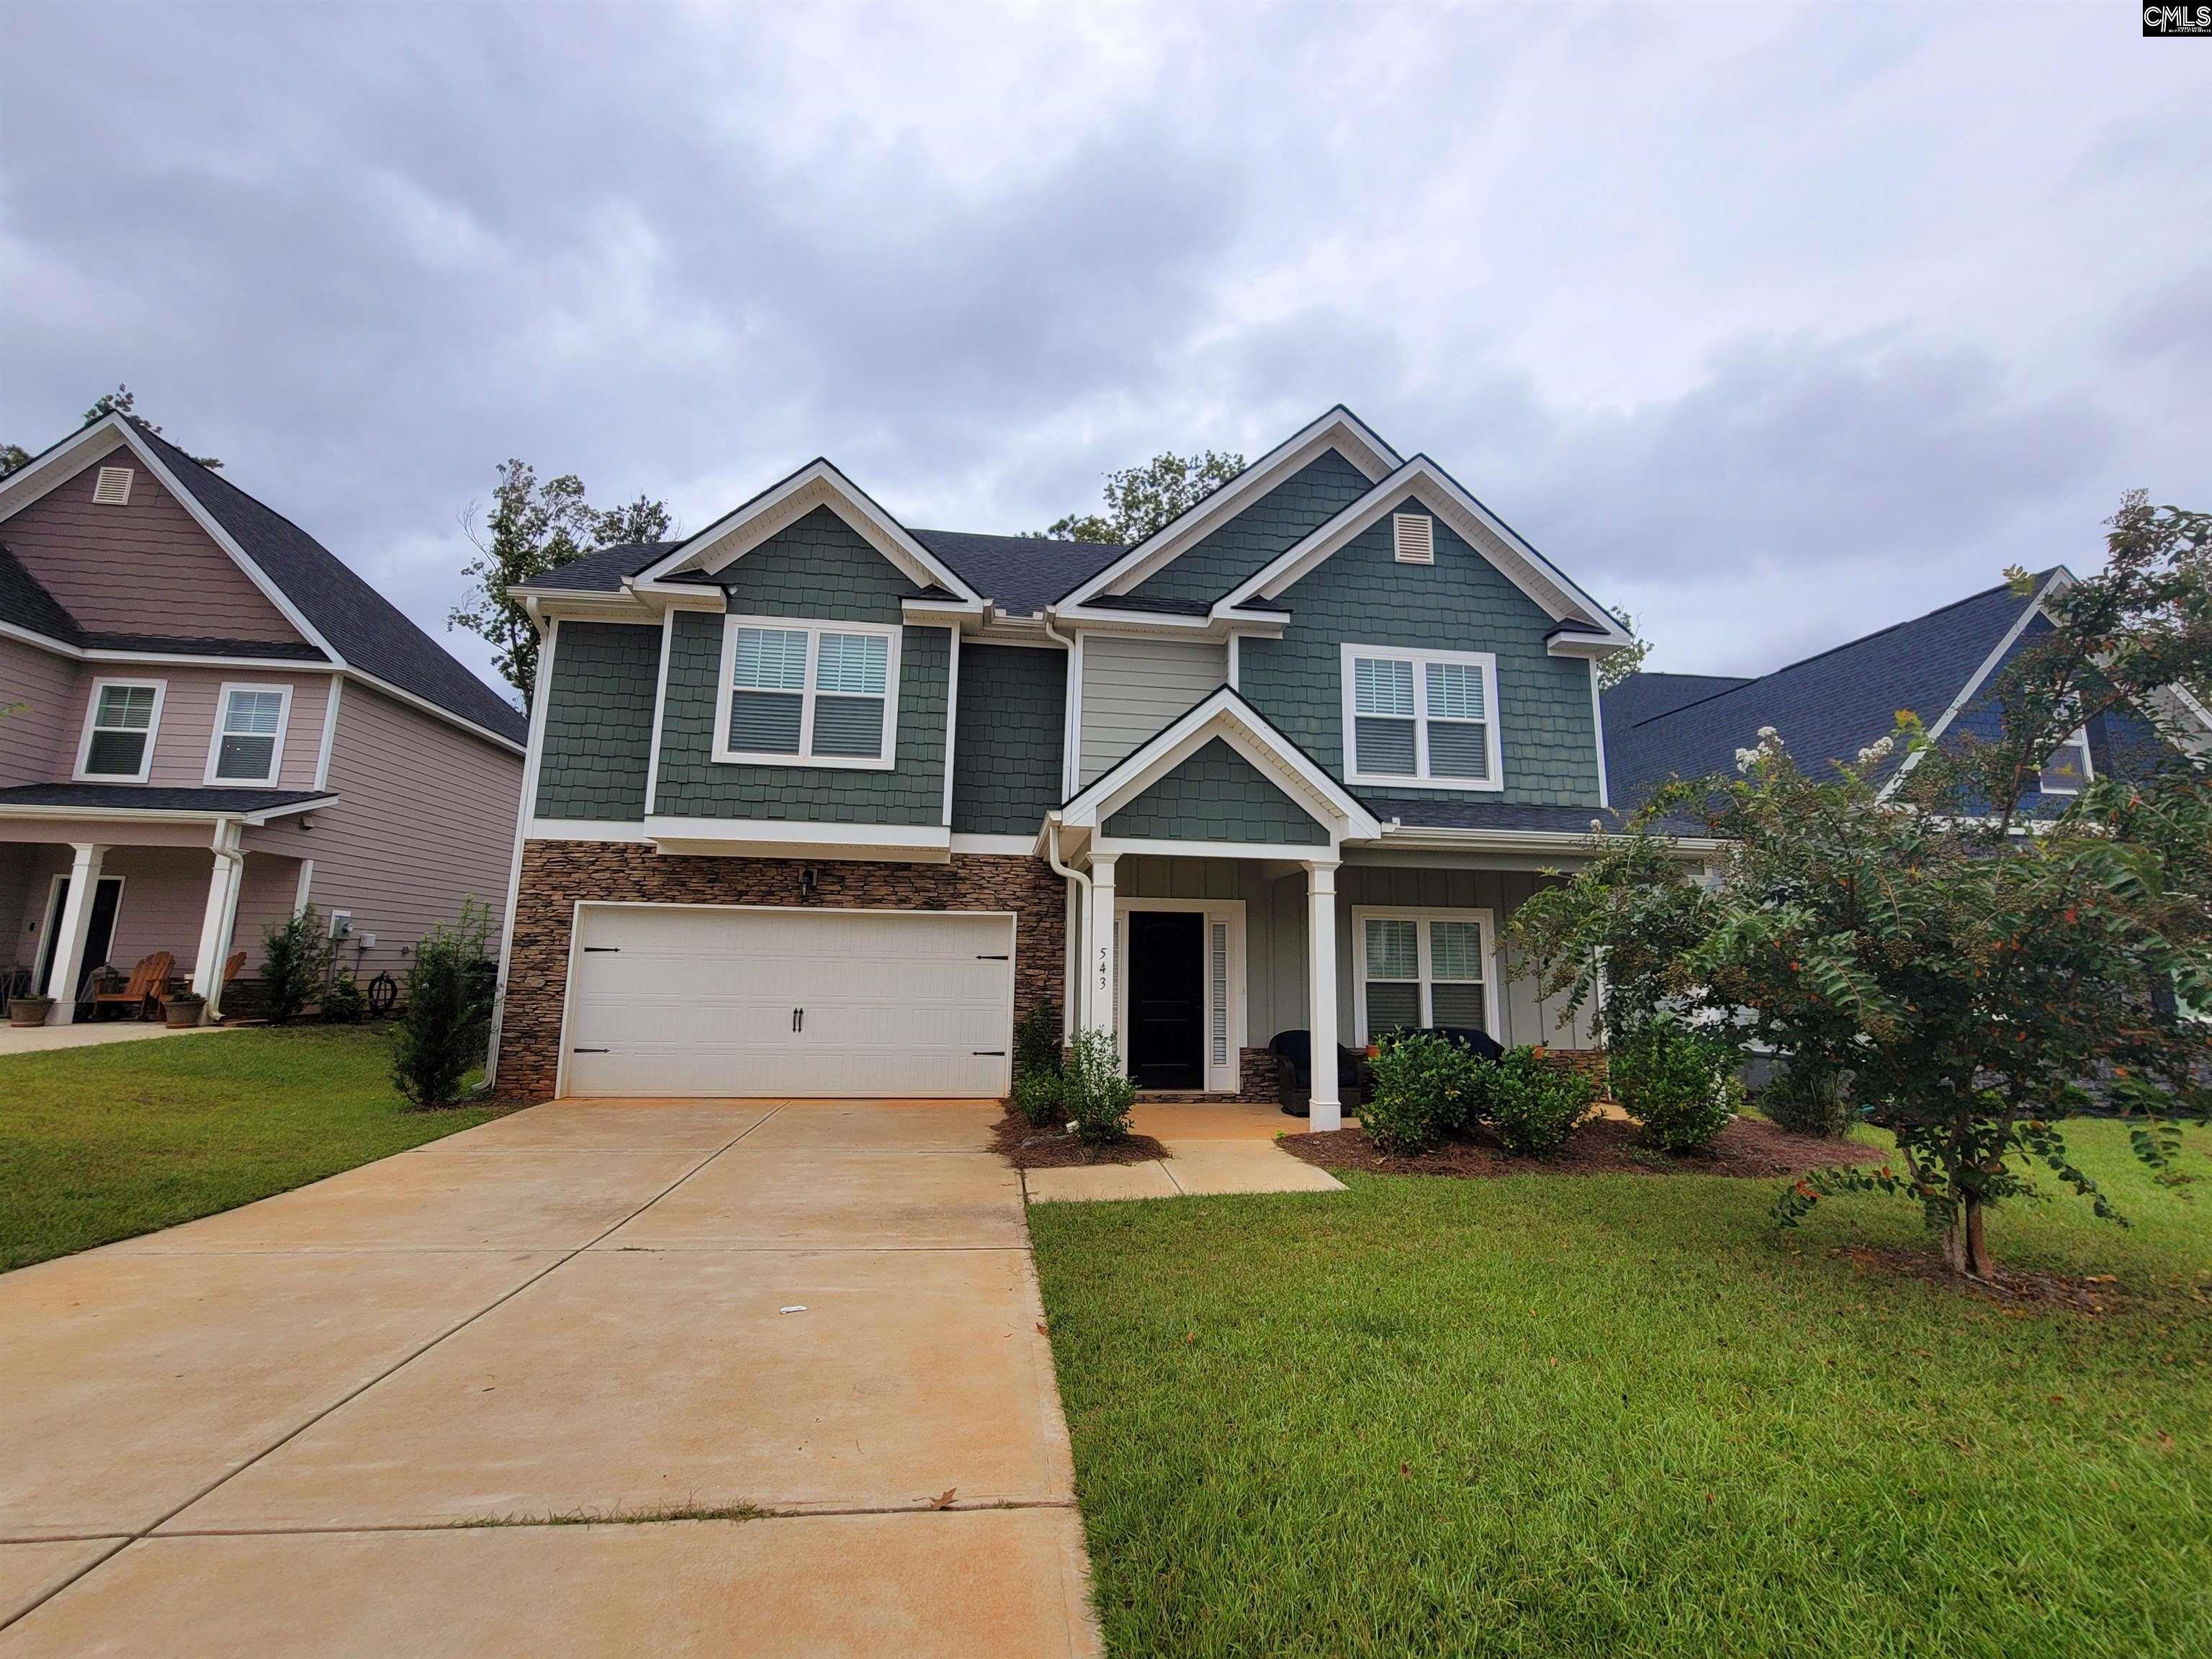 543 Treehouse Lane Lexington, SC 29072